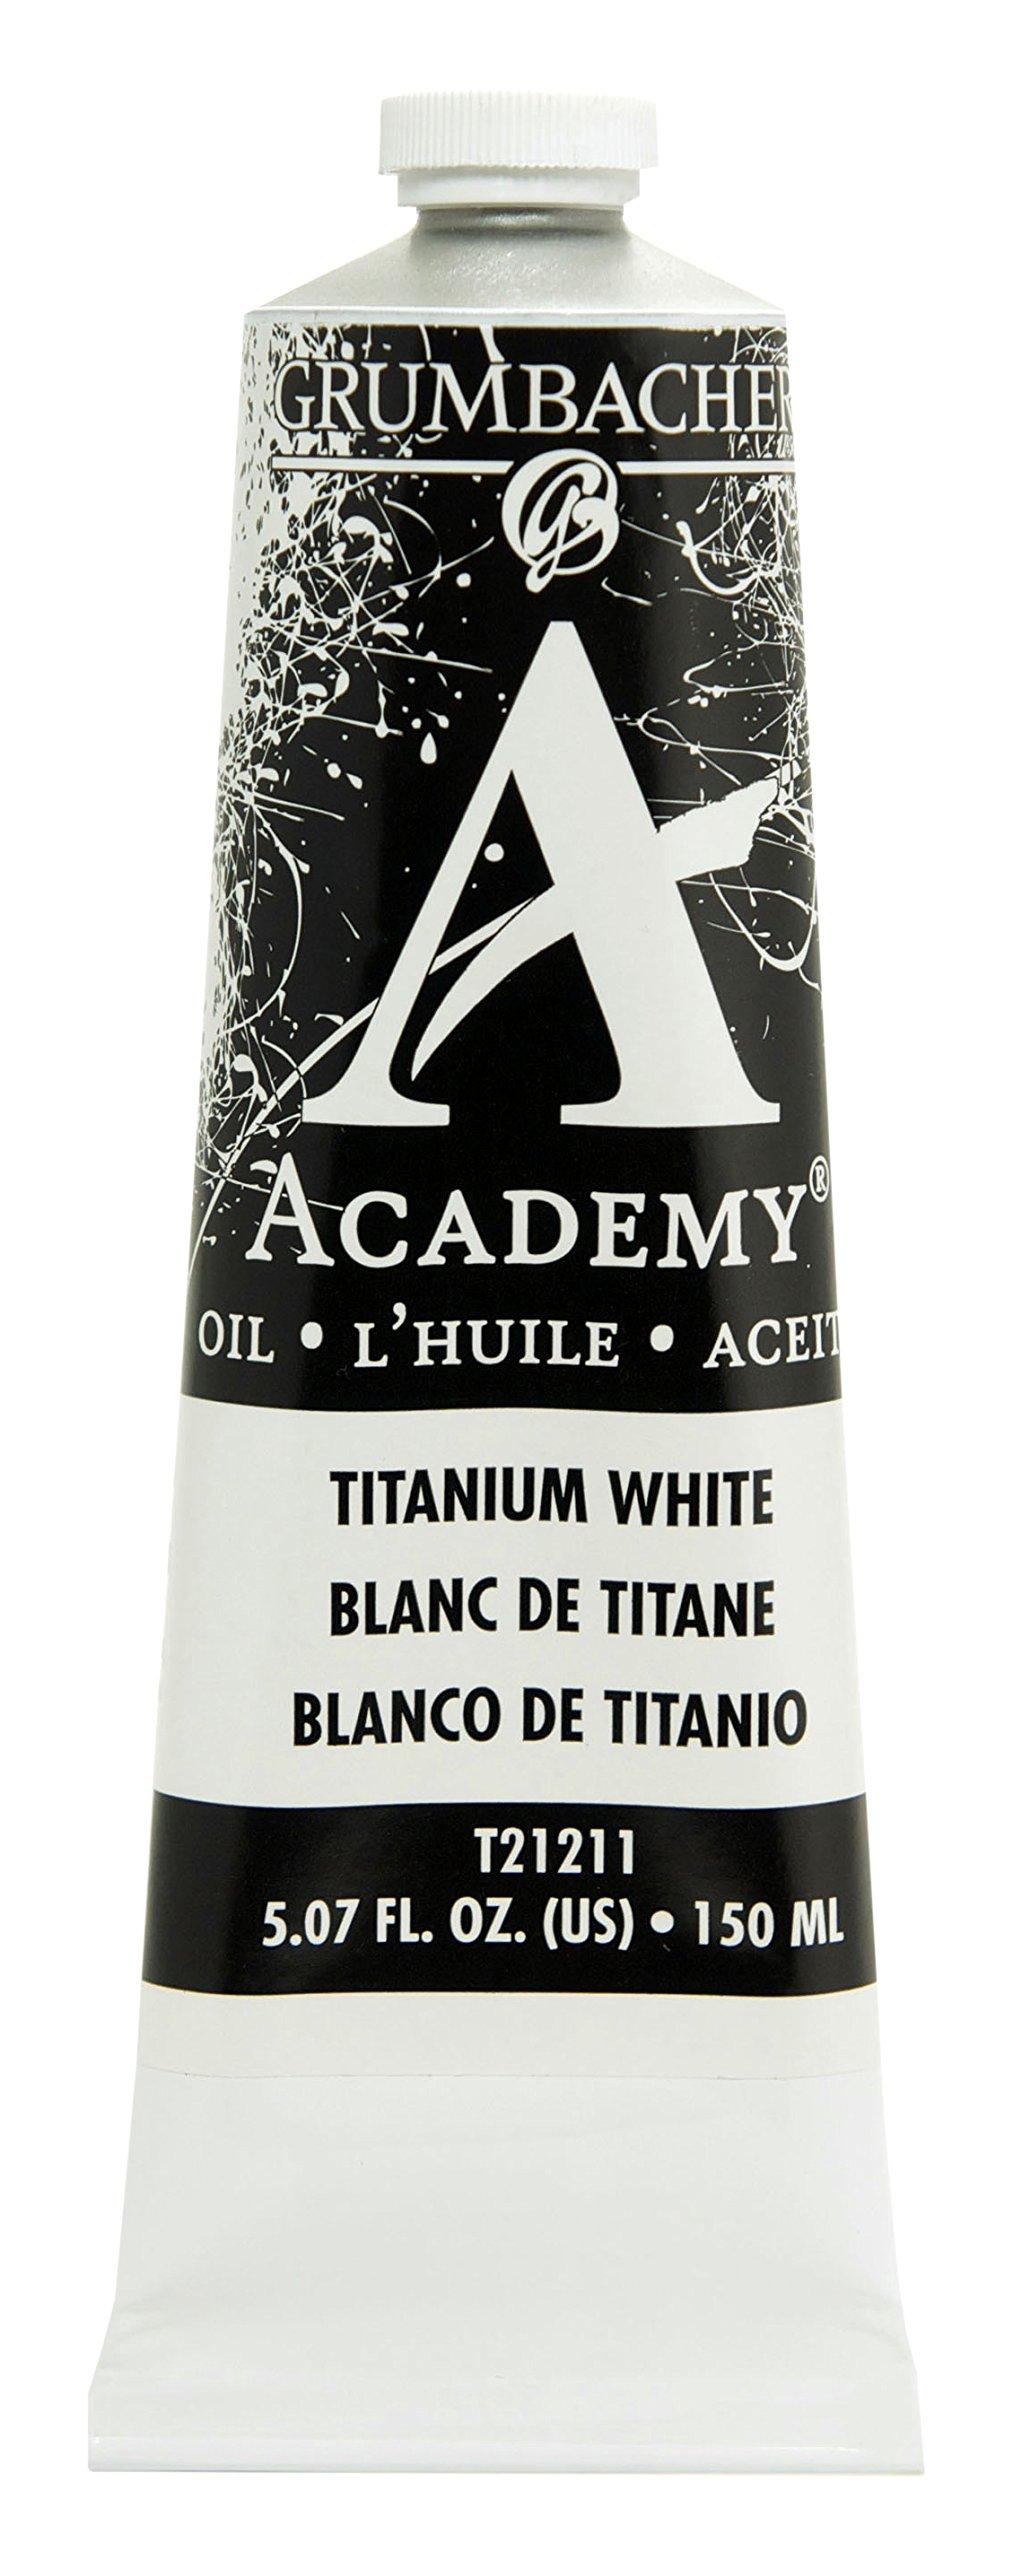 Grumbacher Academy Oil Paint, 150 ml/5.07 oz, Titanium White